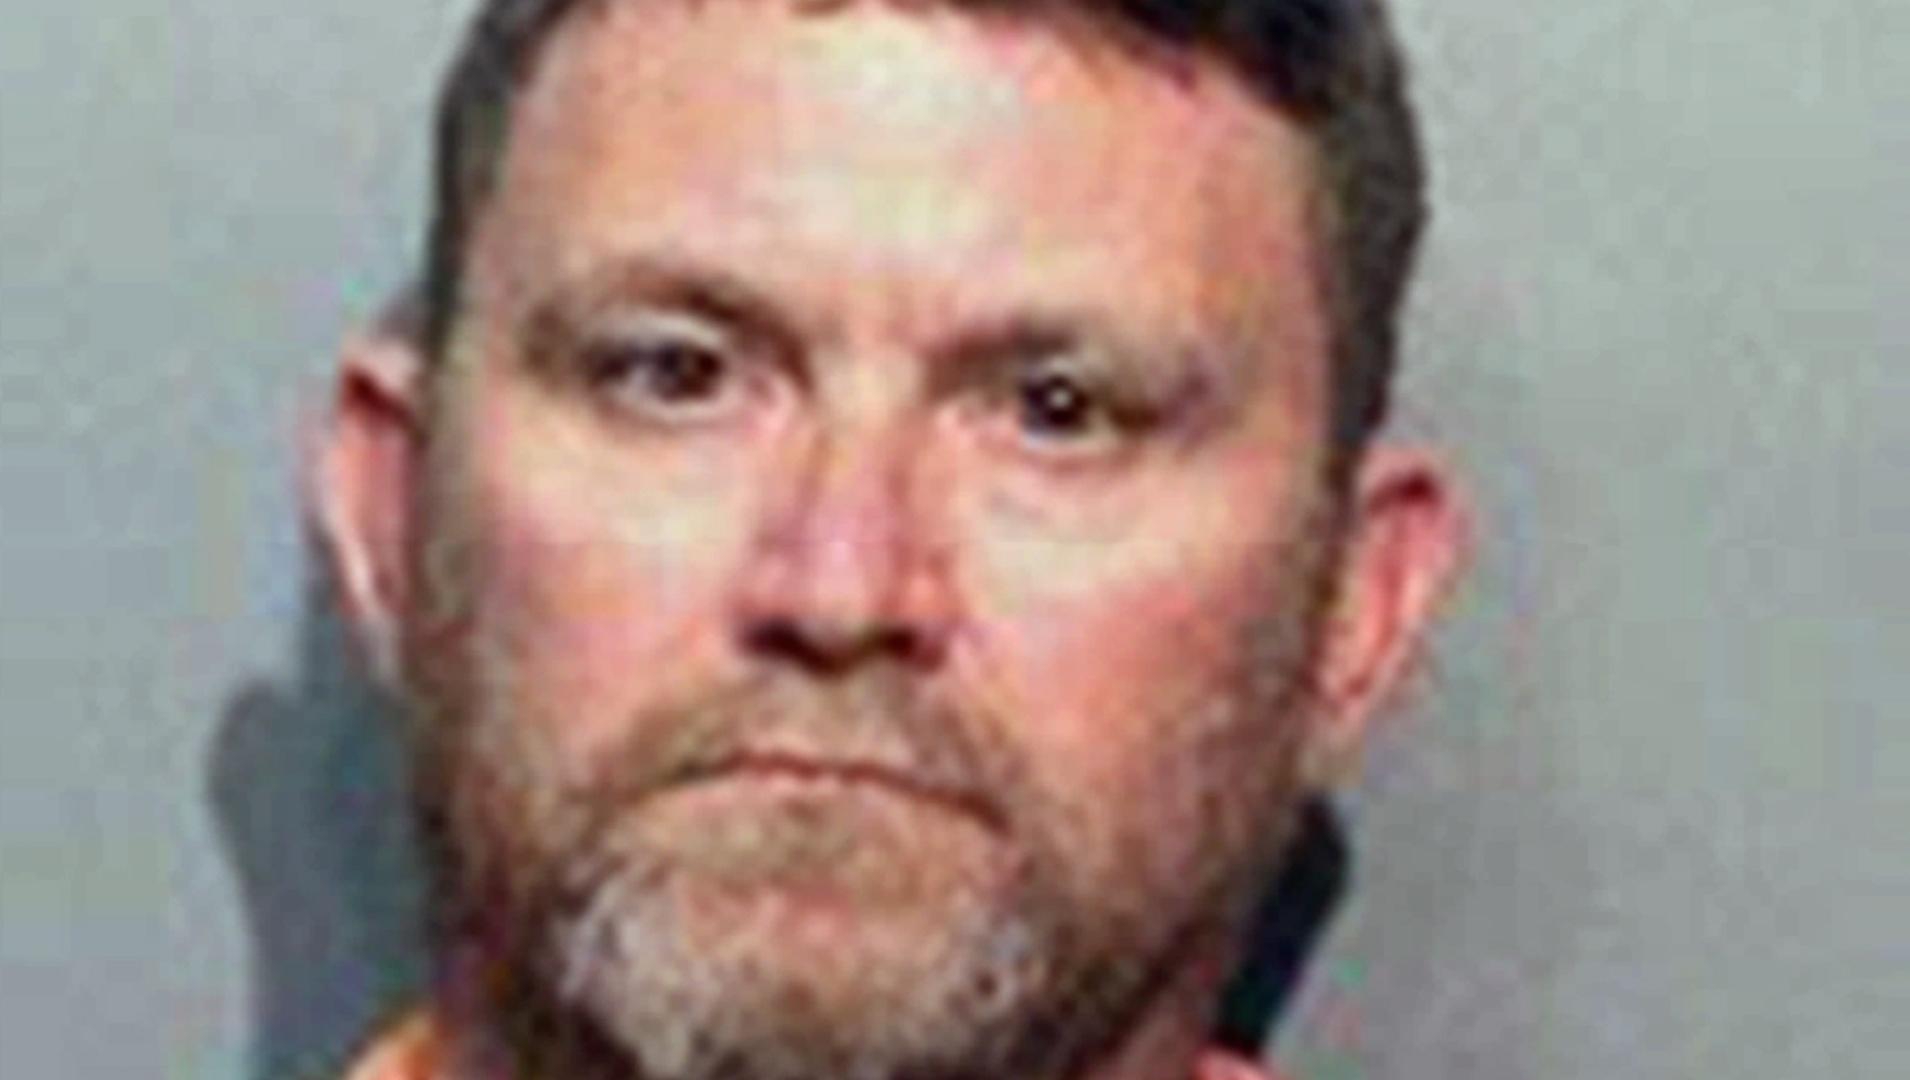 Iowa police take suspect in 'ambush-style' killings of two officers into custody